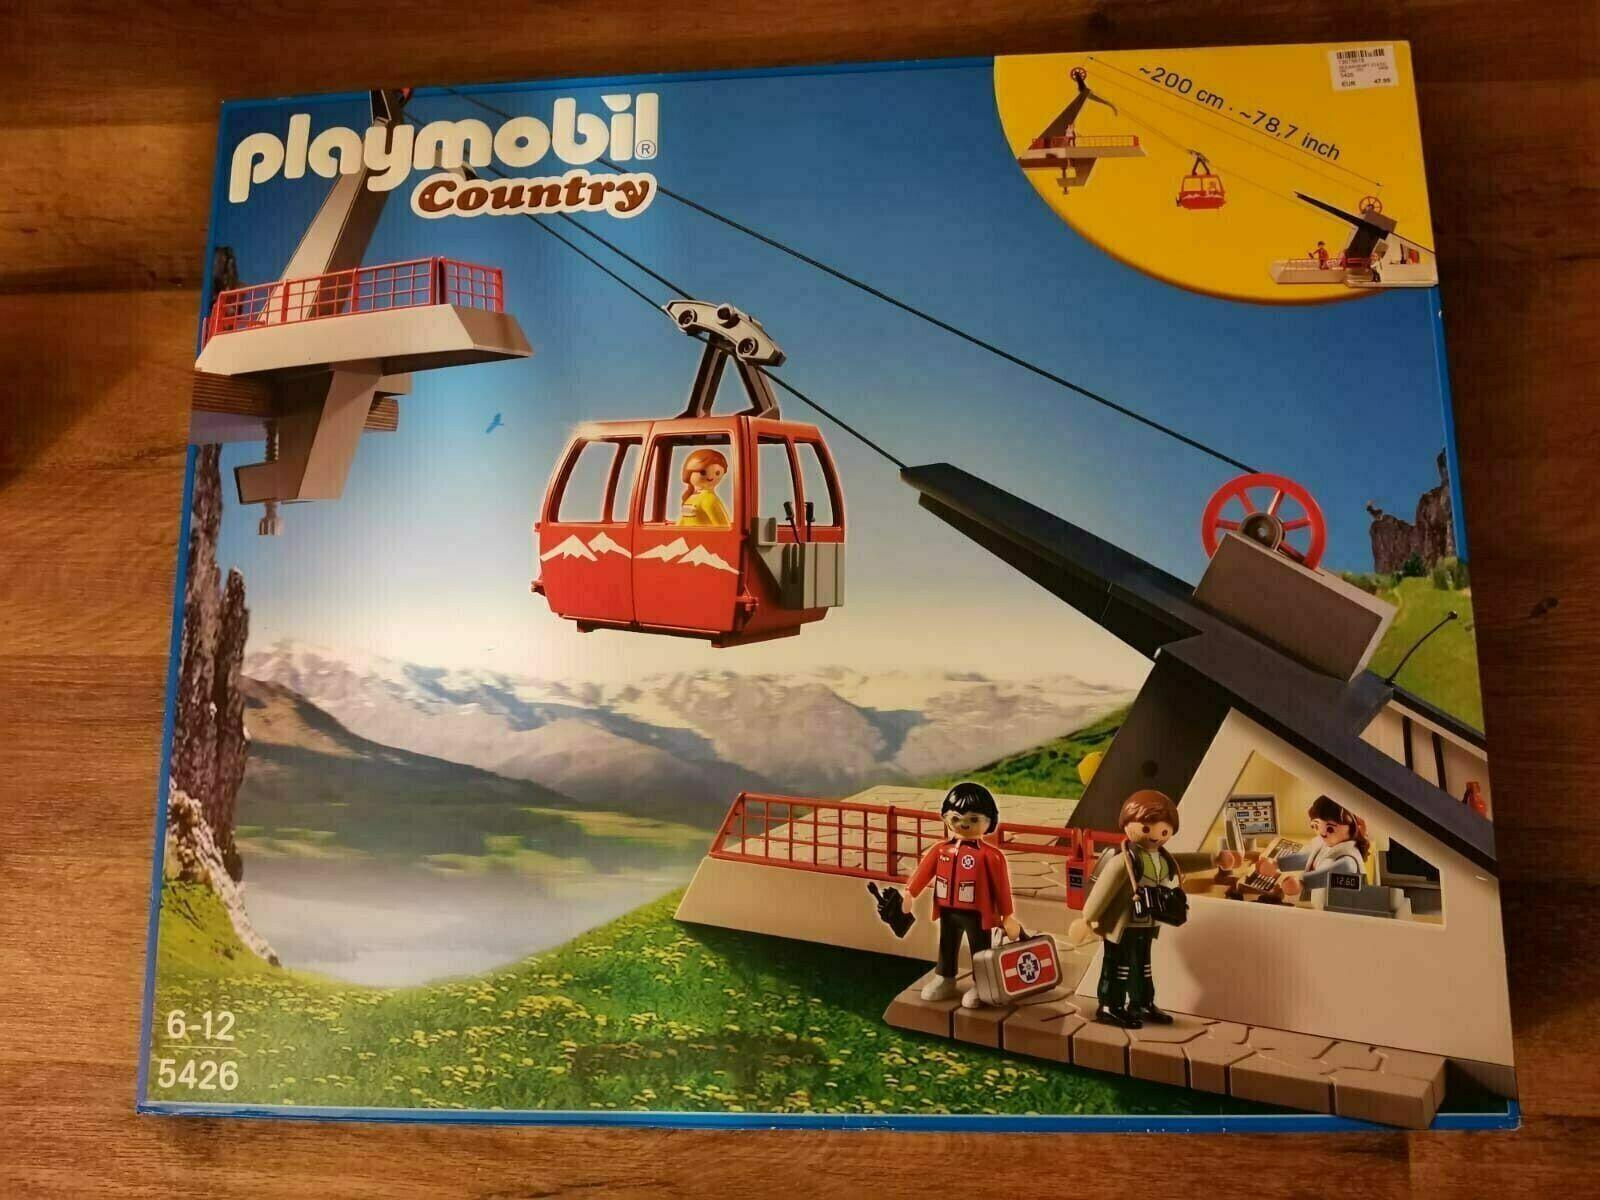 Playmobil Country Seilbahn mit Bergstation 5426 von 2012 Neu & OVP